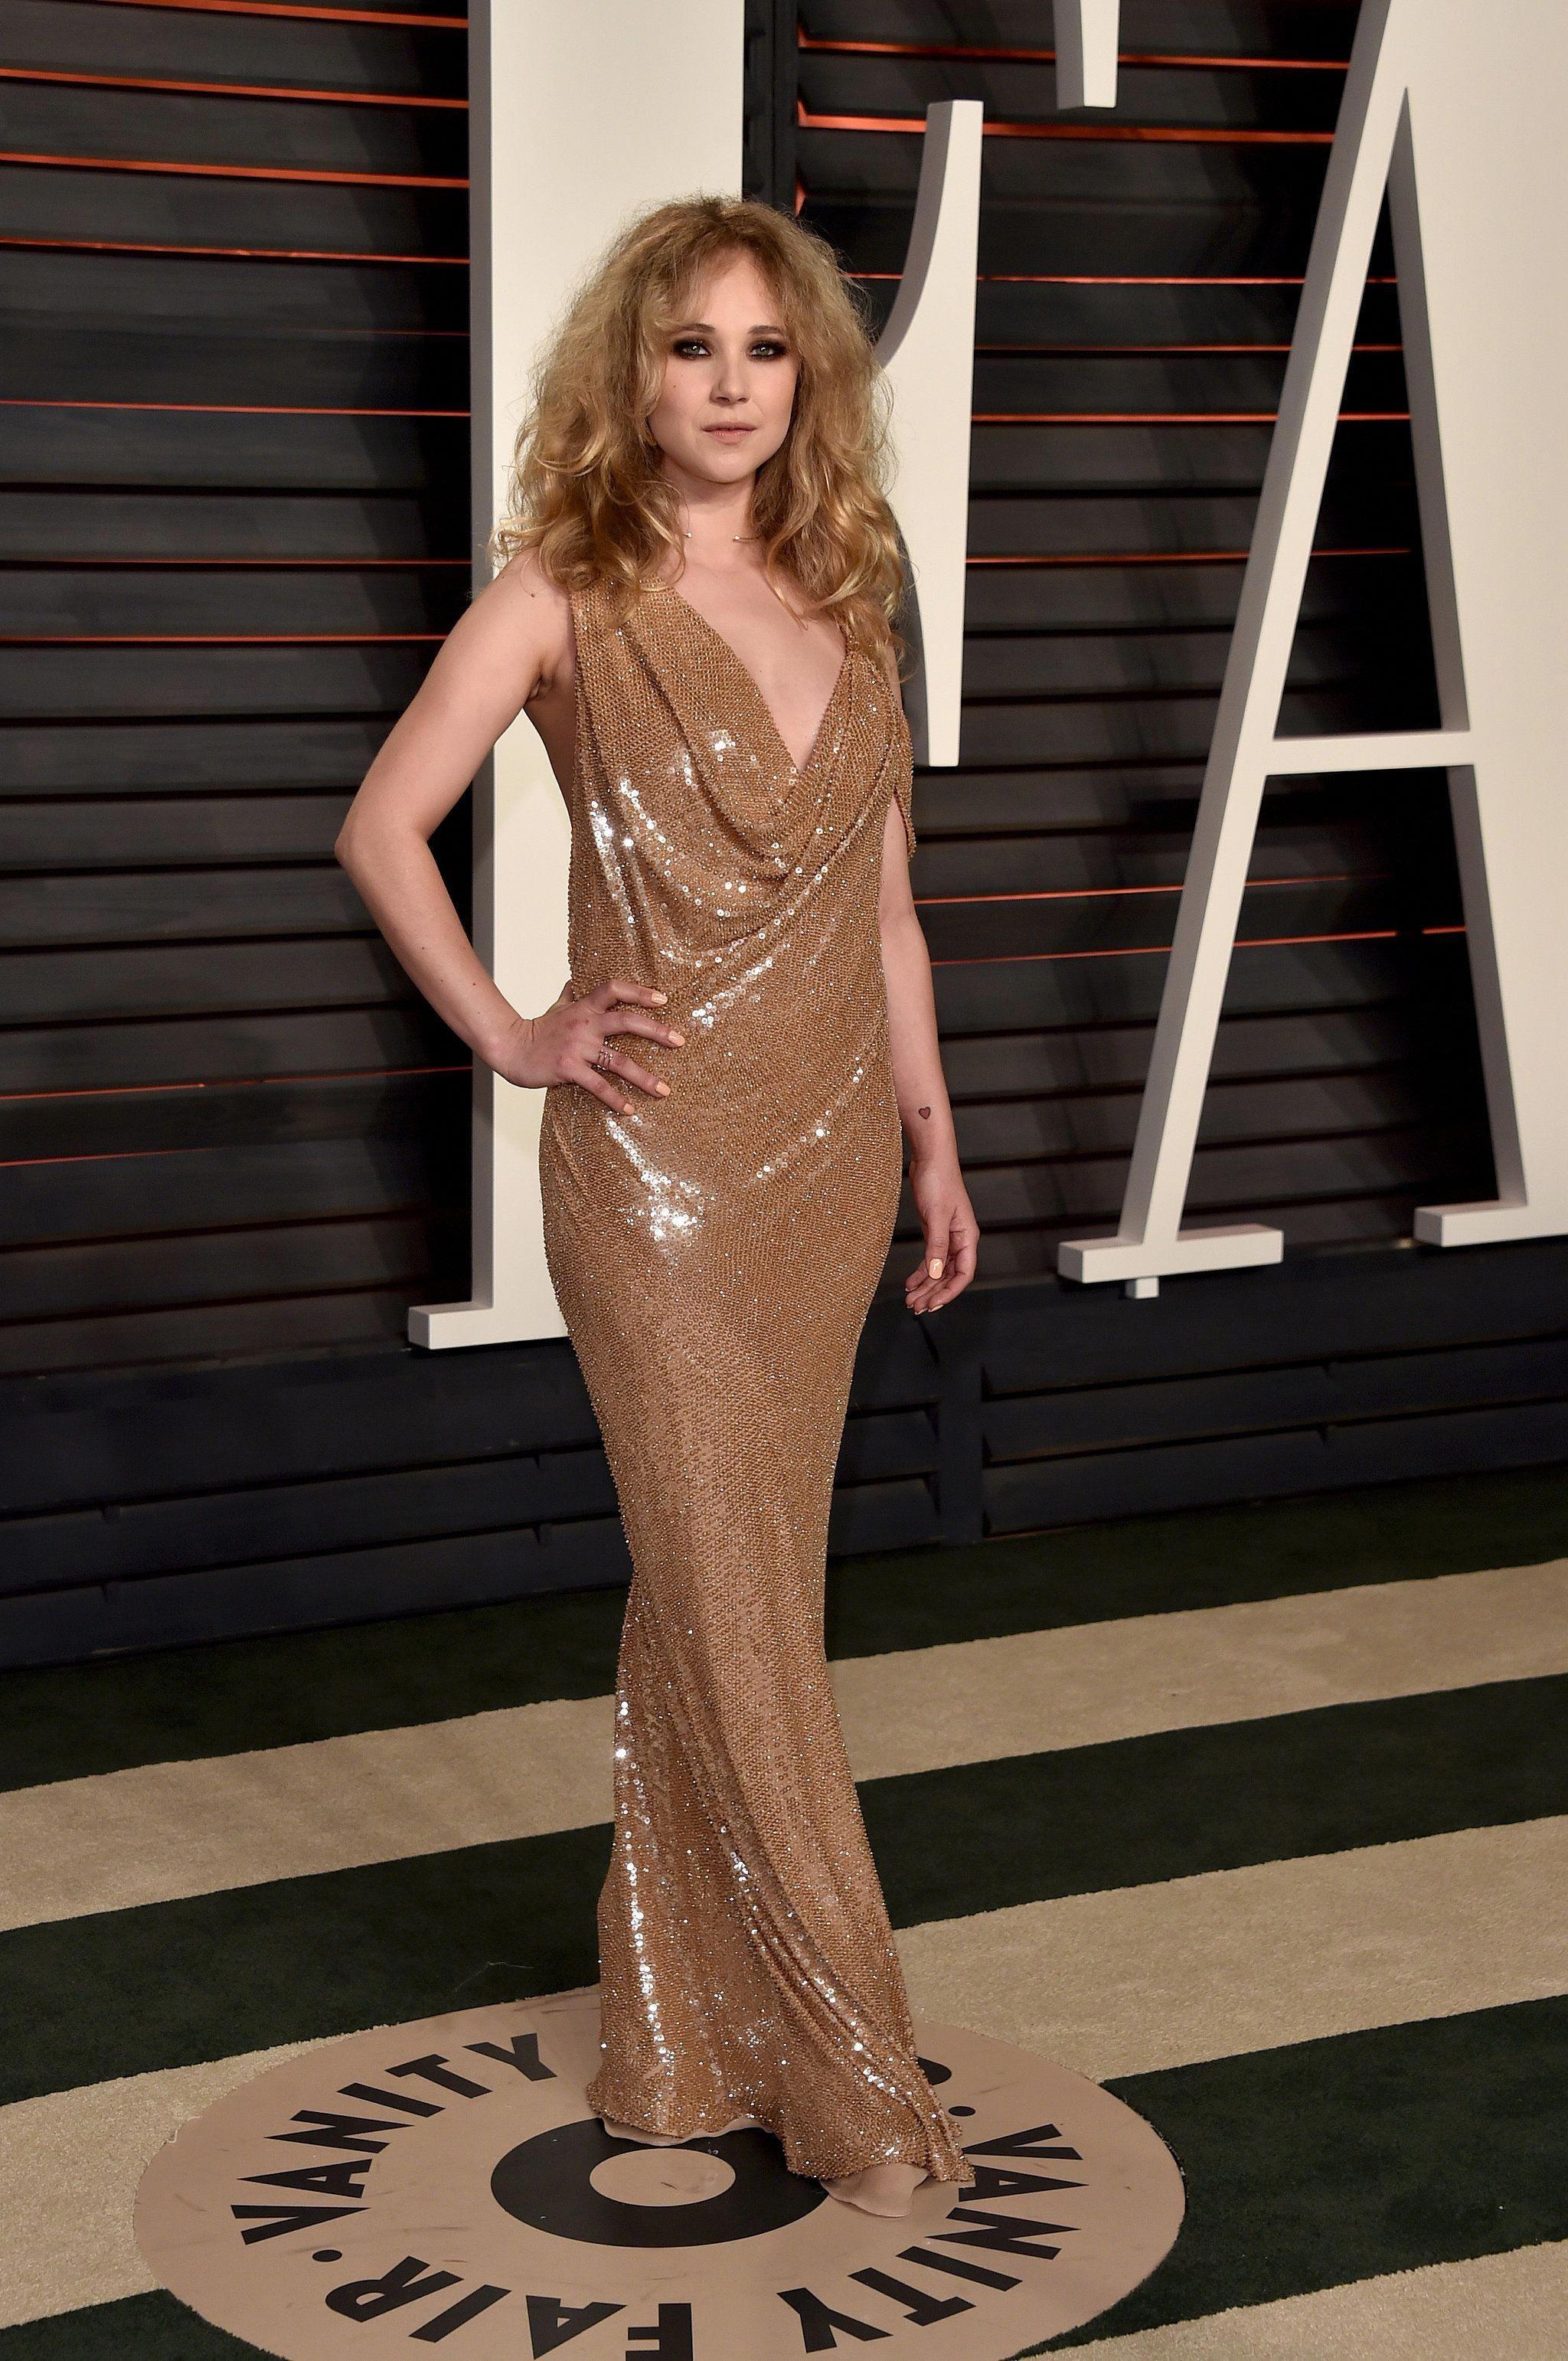 Celebrity Juno Temple nudes (12 photos), Sexy, Paparazzi, Feet, in bikini 2018